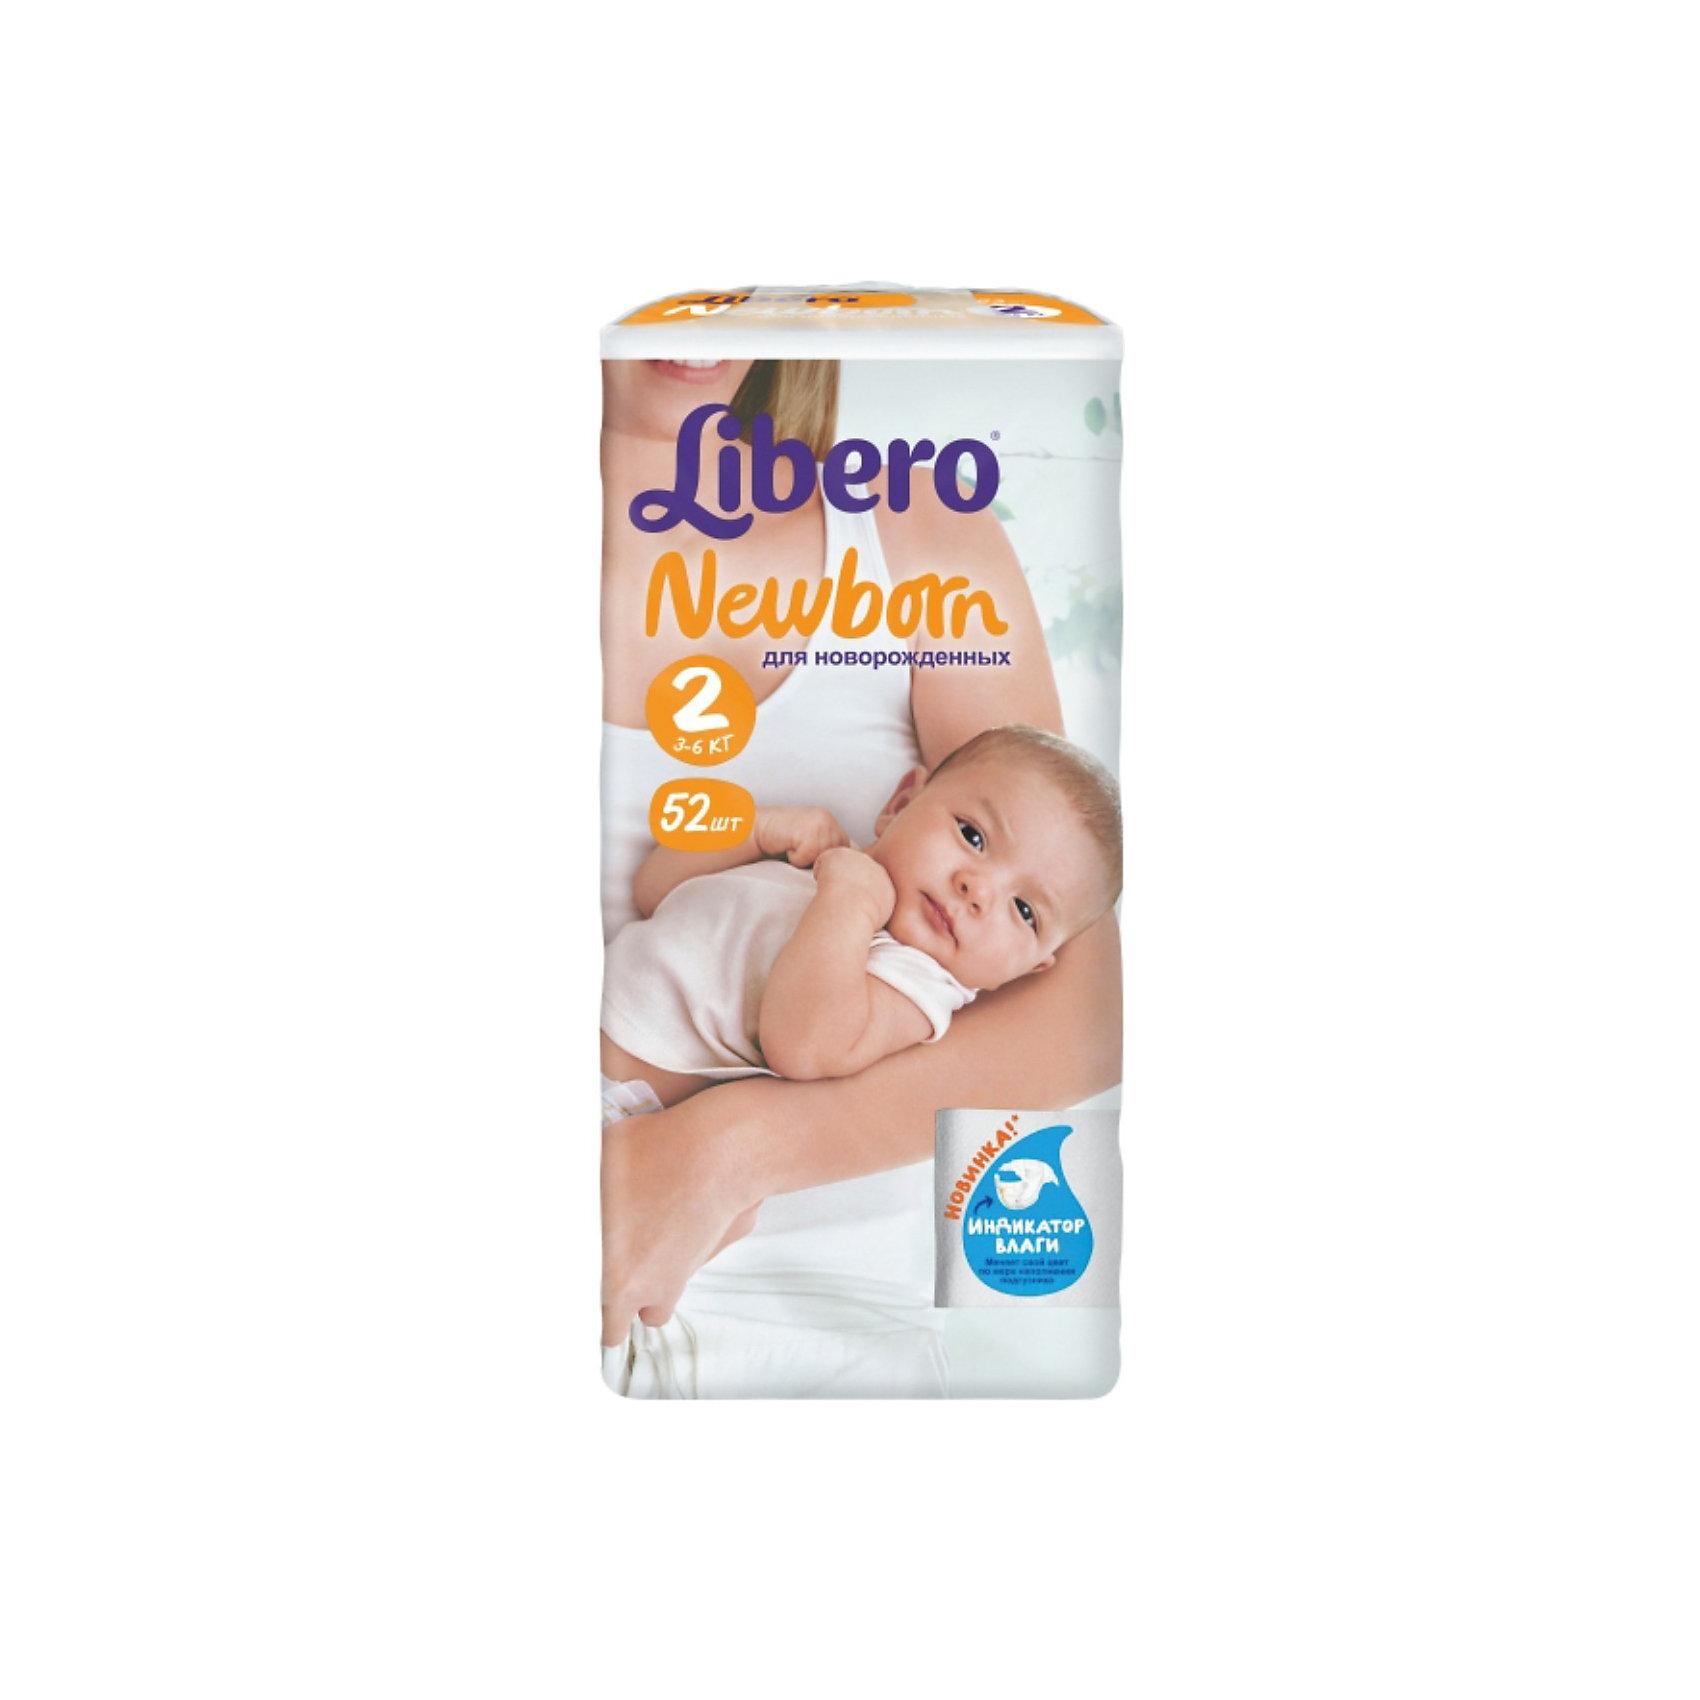 Подгузники Libero Newborn, Mini 3-6 кг (2), 52 шт. от myToys